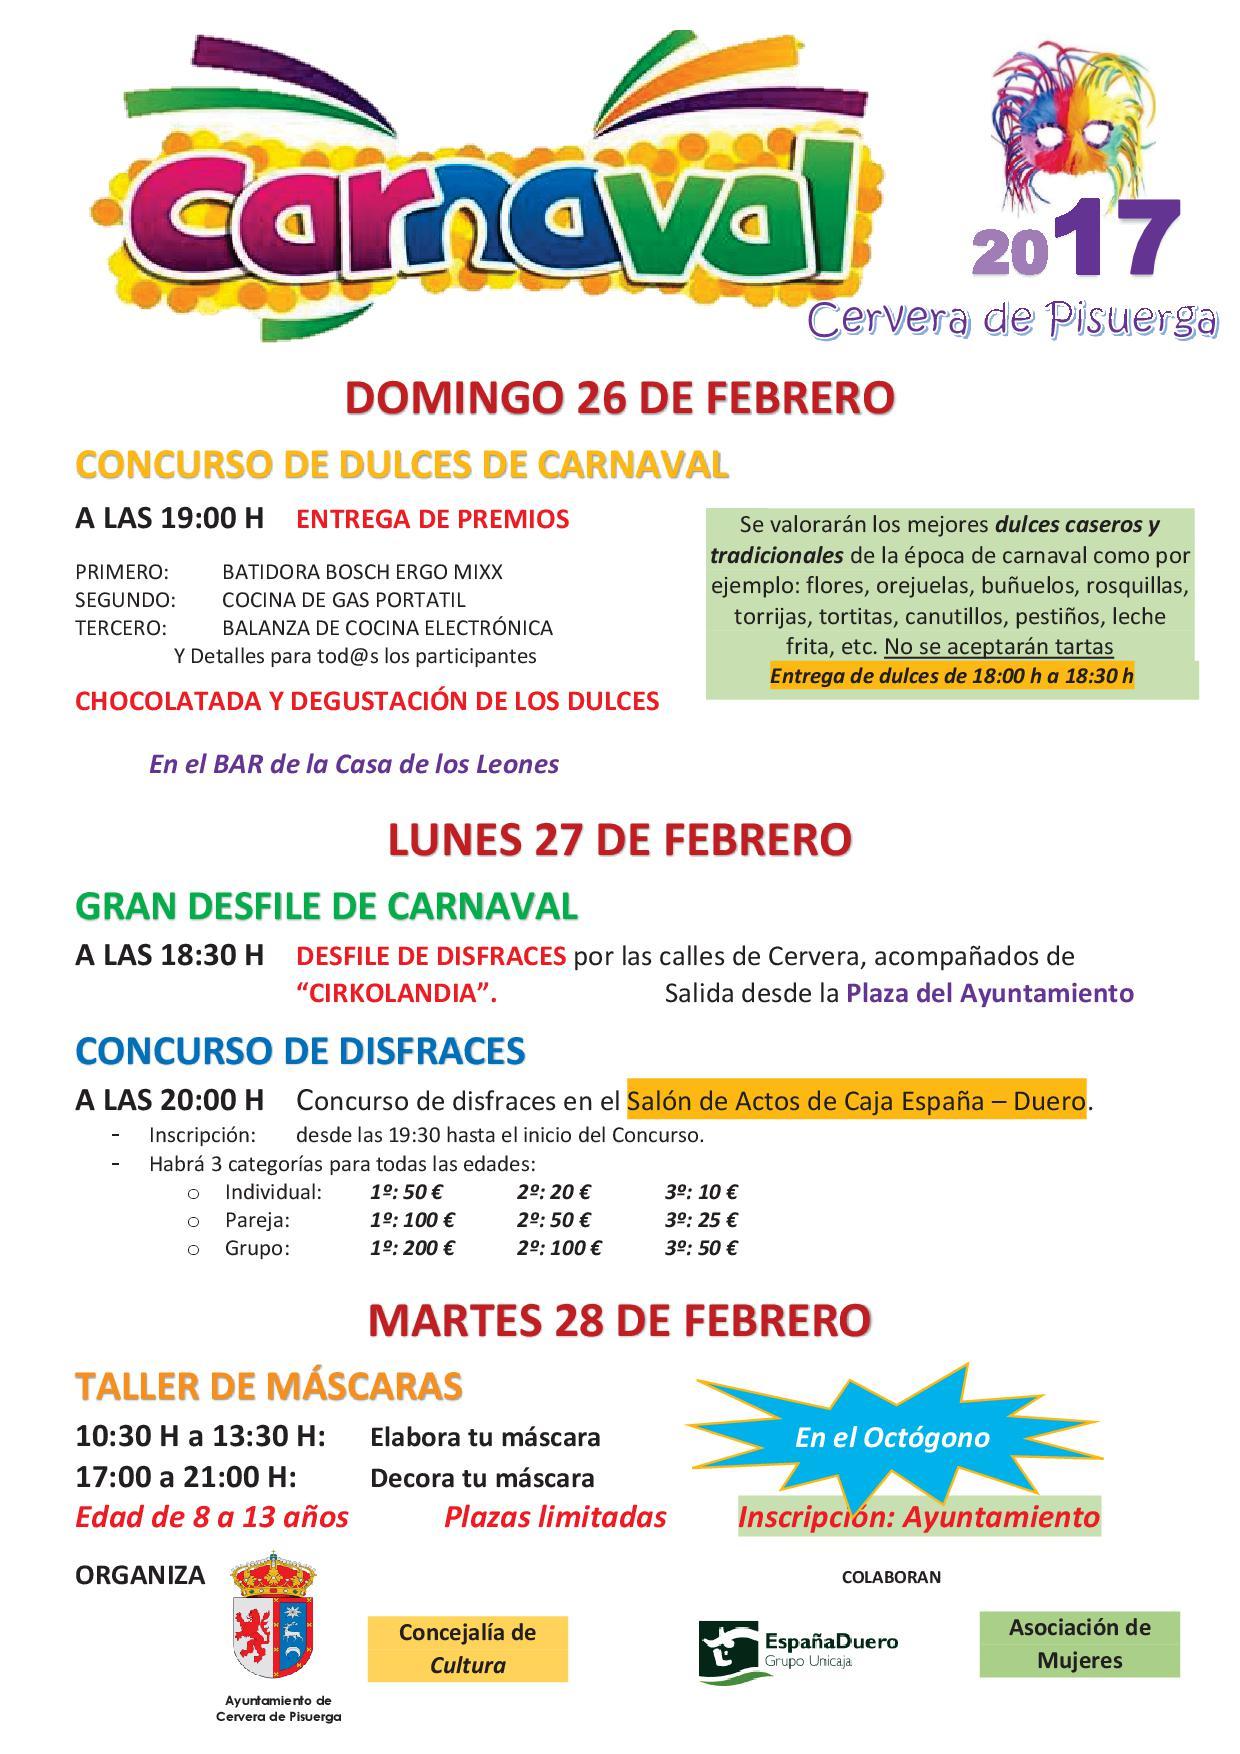 Programa de Carnaval 2017